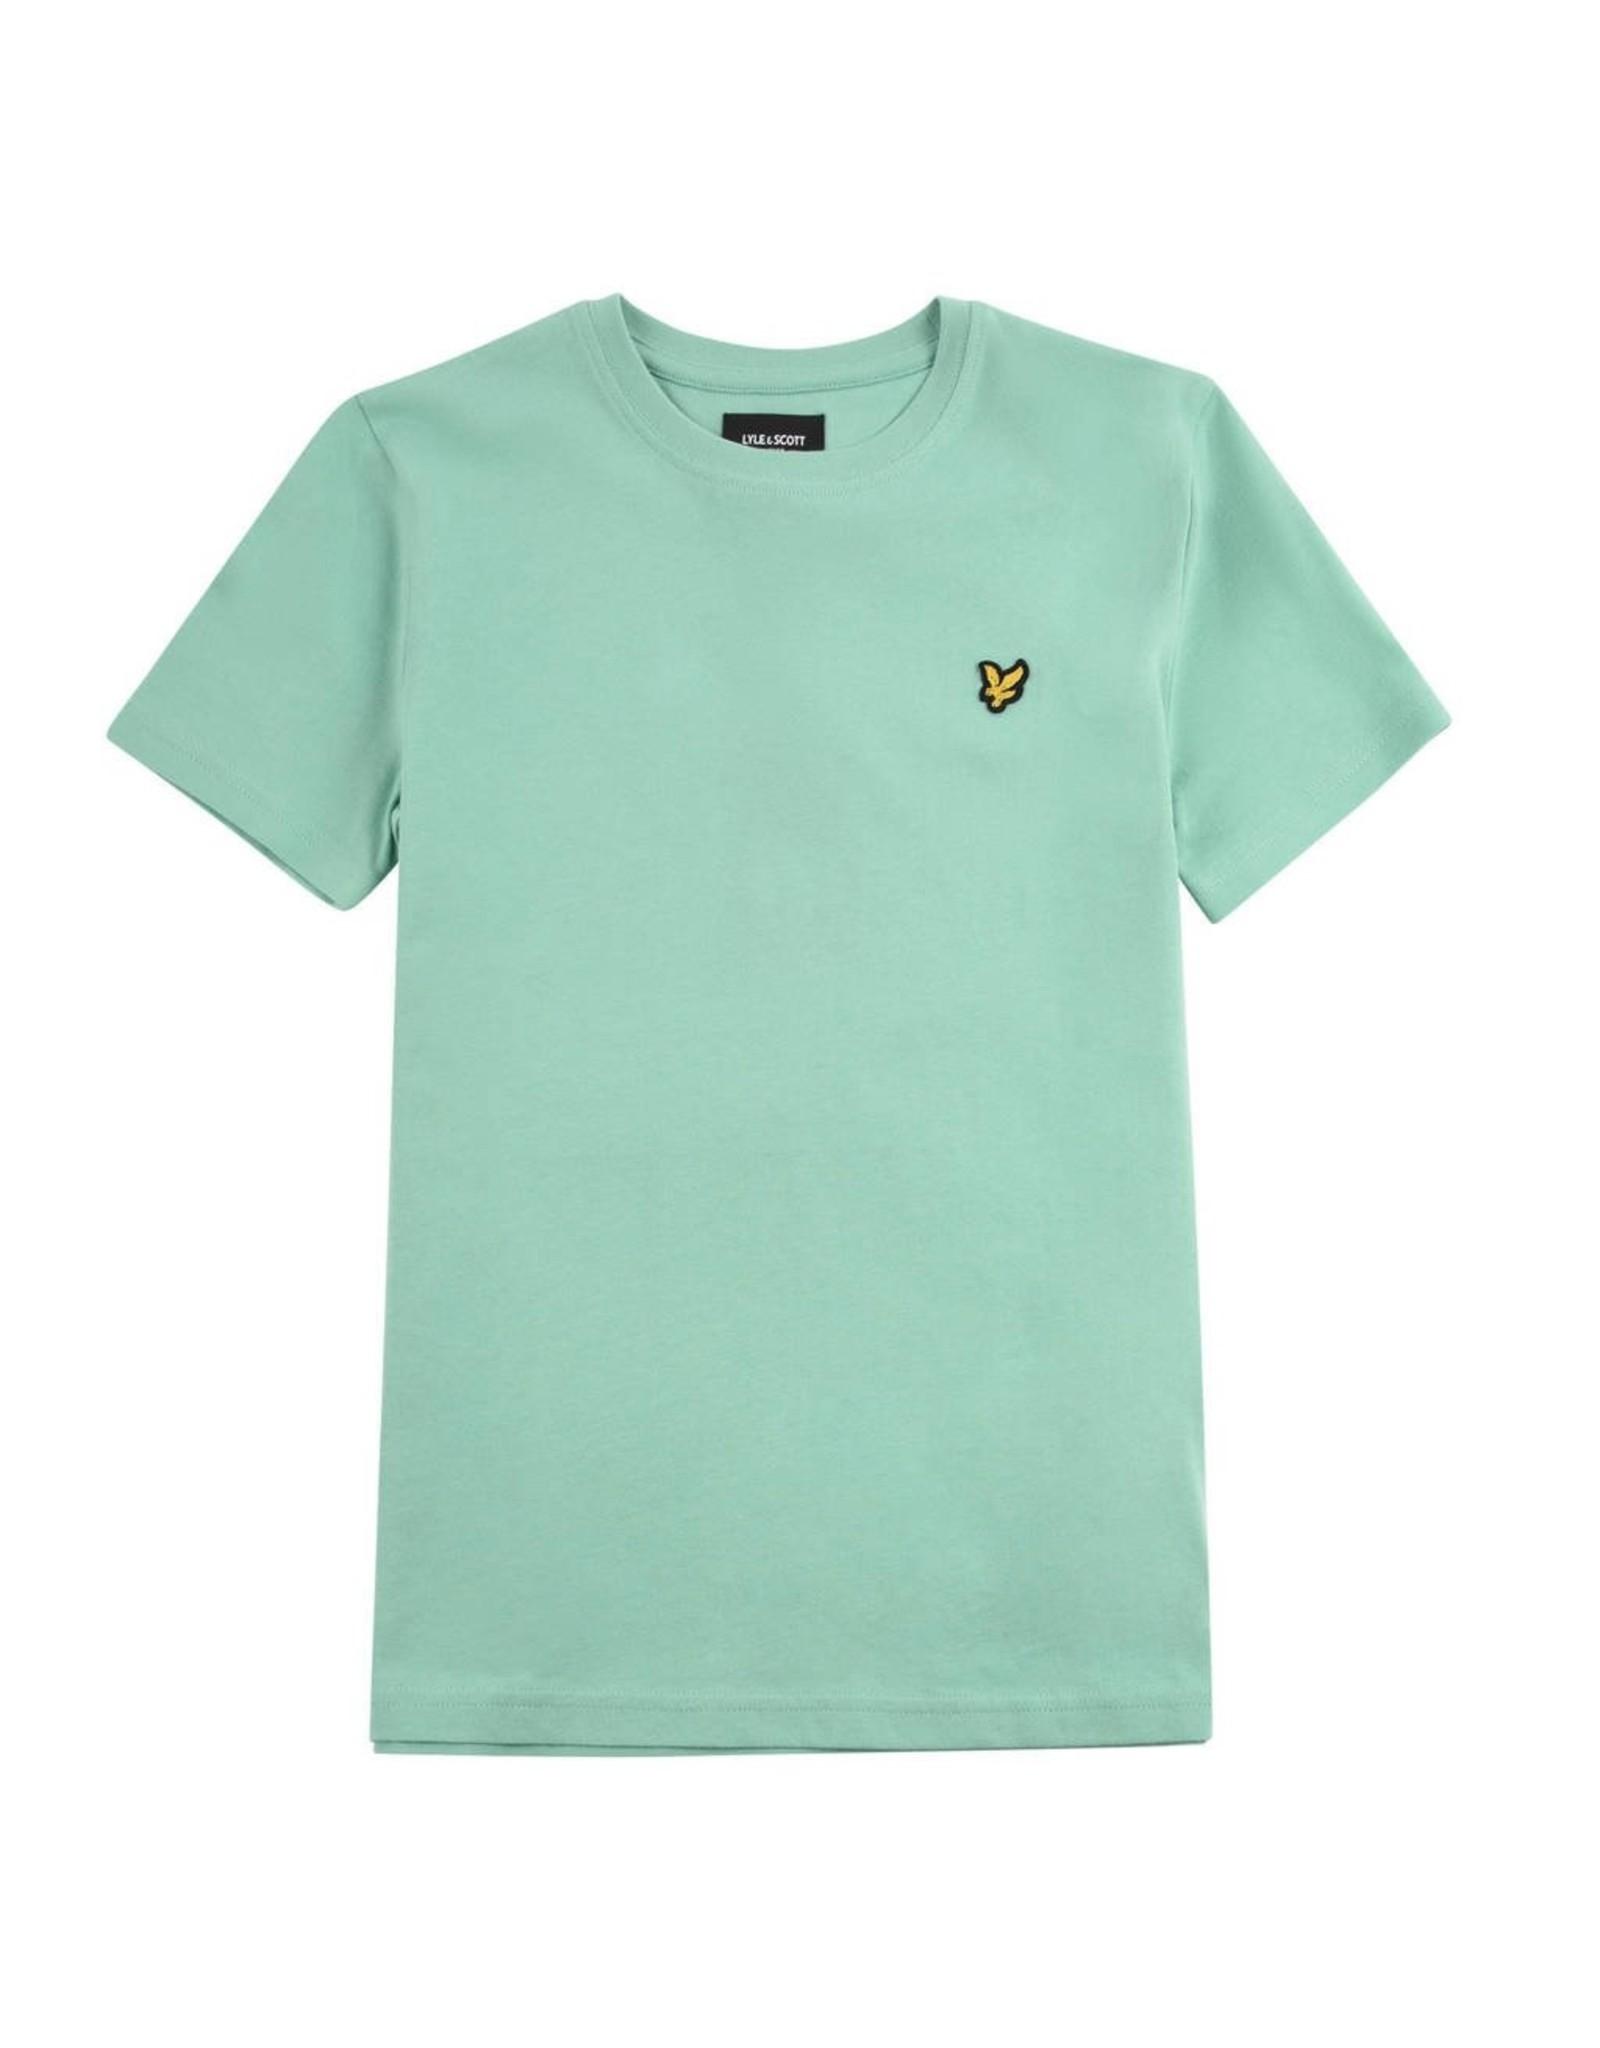 Lyle & Scott Boys Classic T Shirt Neptune Green